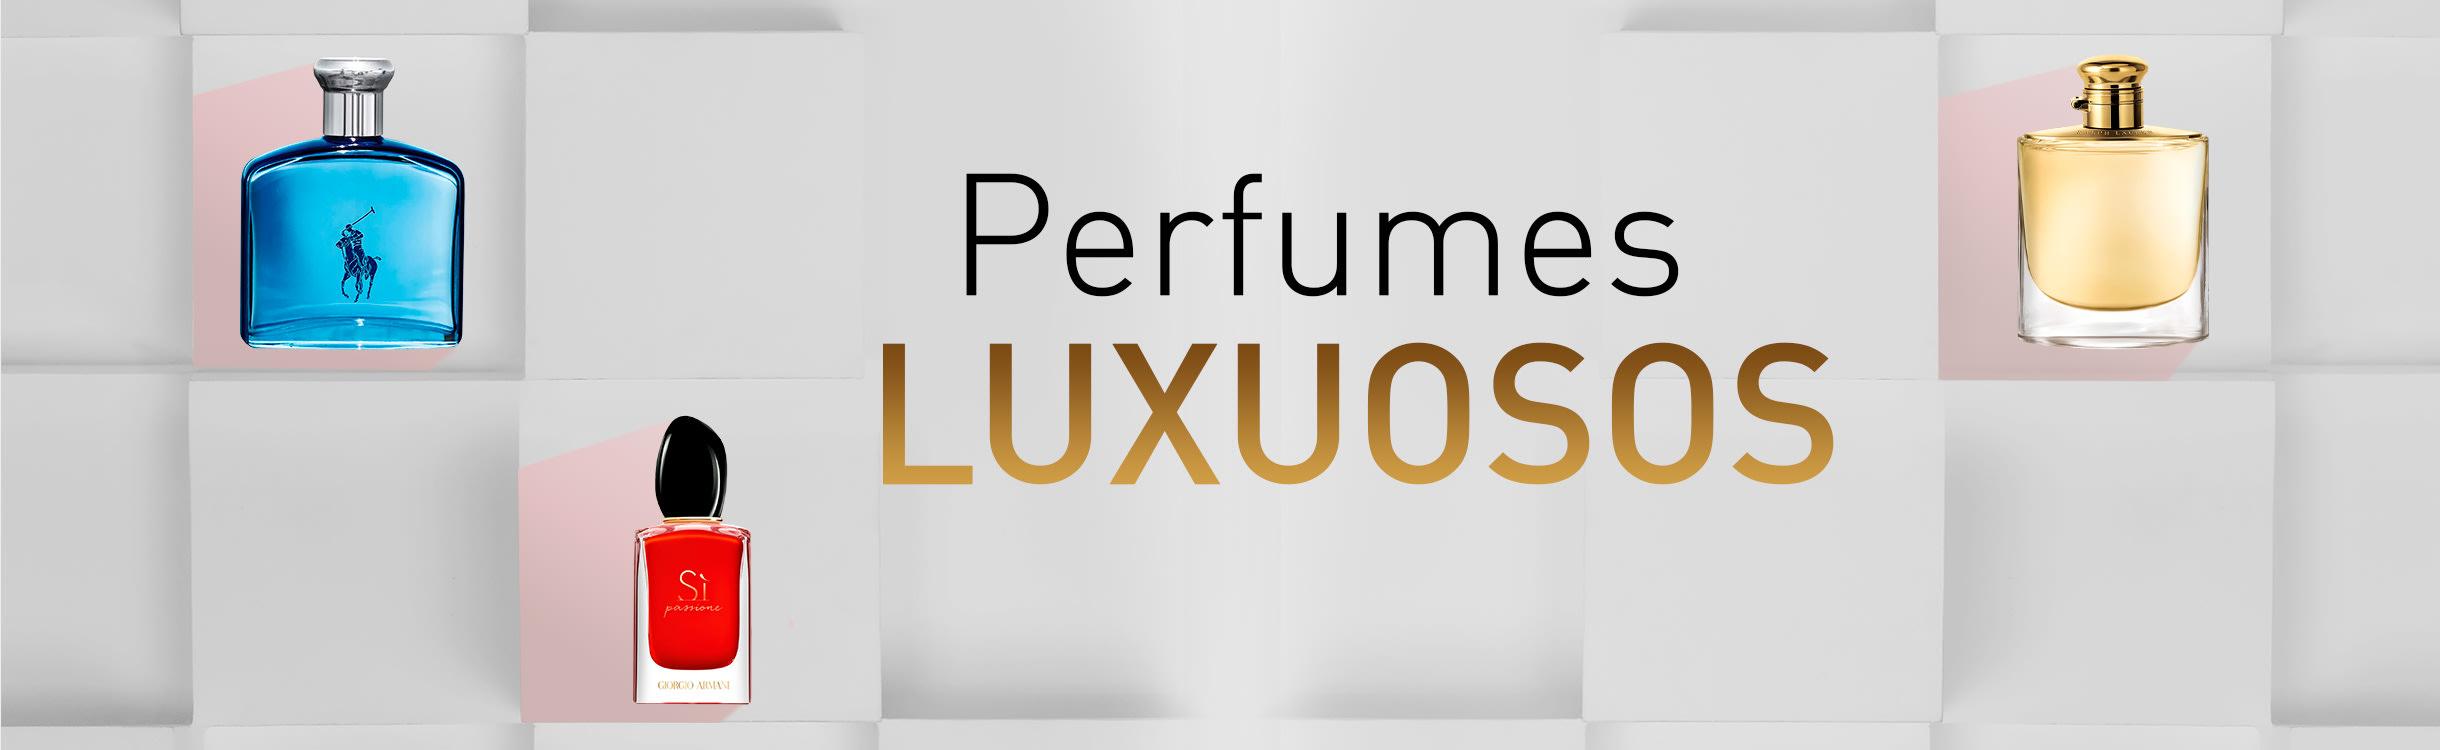 B de Beleza - Perfumes Luxuosos